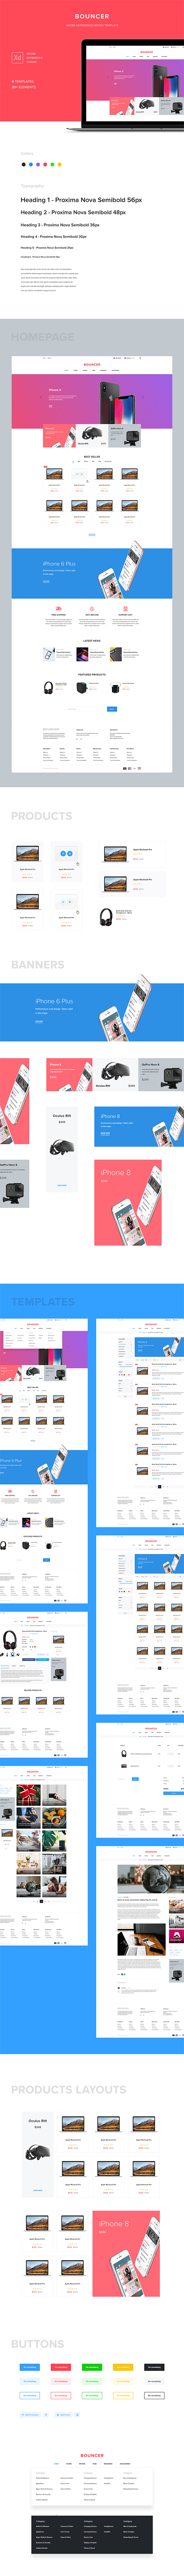 Freebie : Creative Ecommerce UI Kit For Designers (Adobe XD)